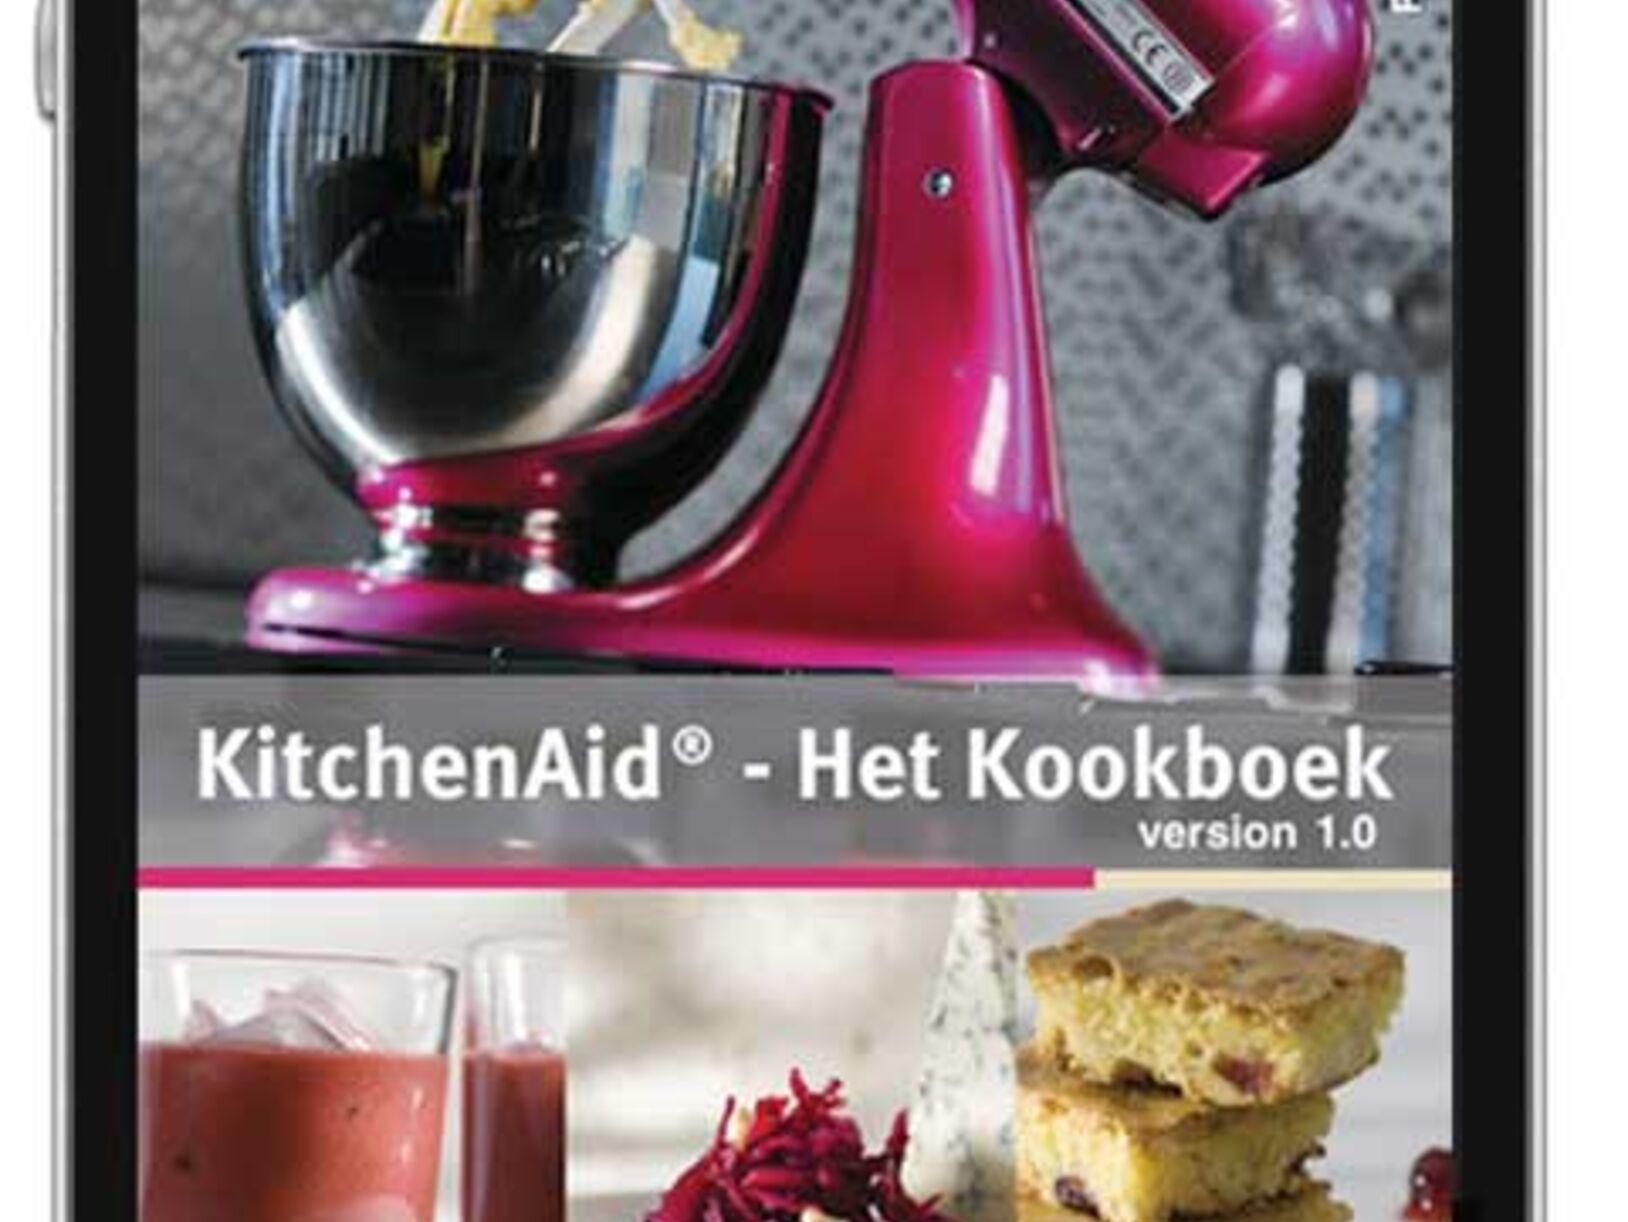 Kitchenaid keukenapparatuur